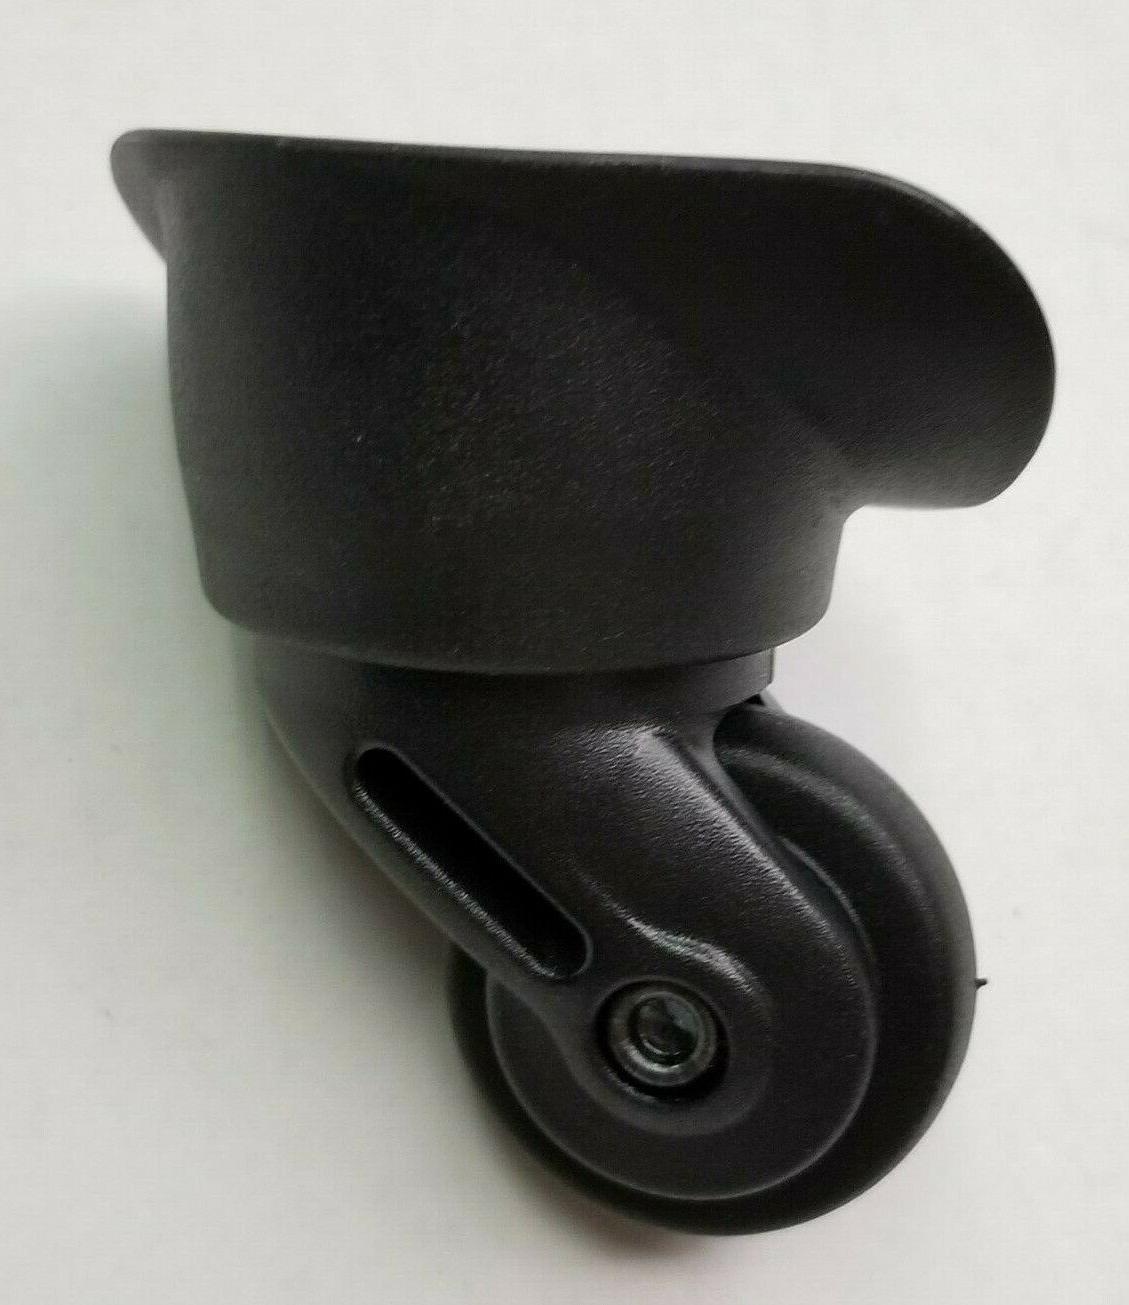 luggage replacement spinner wheel fits ziplite 360